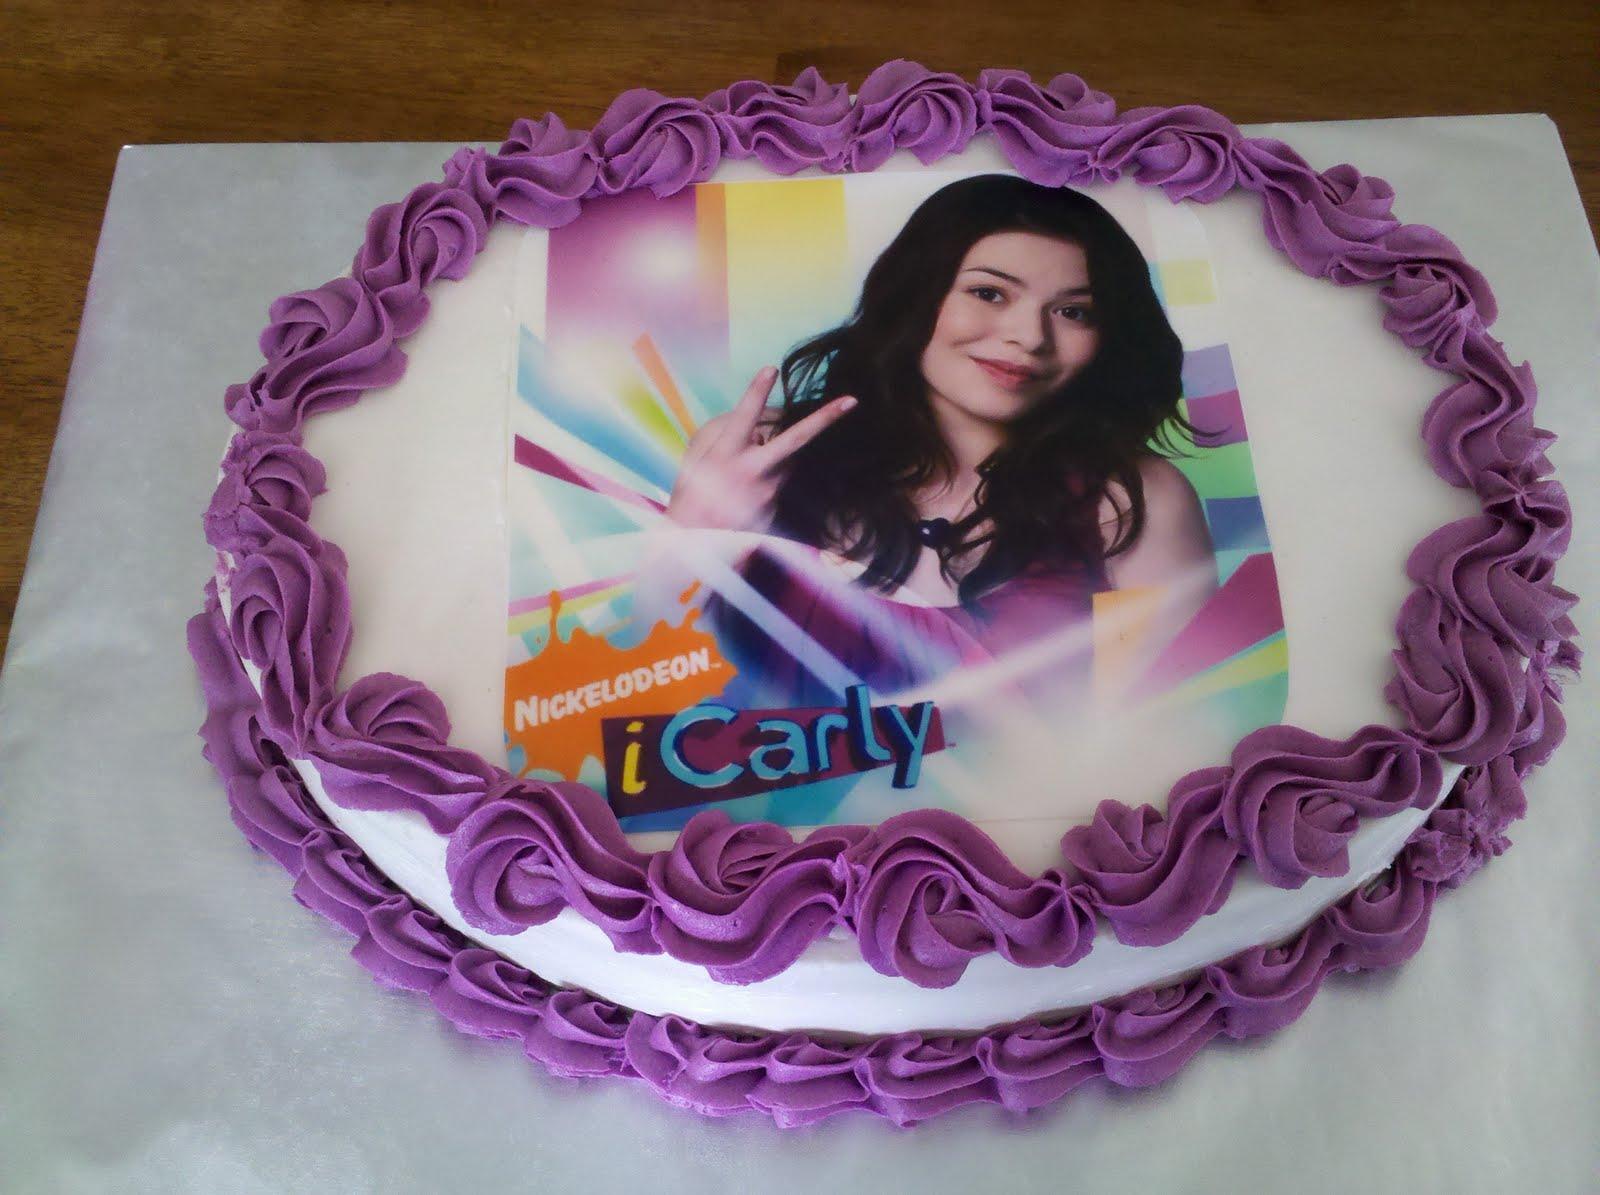 Pin Icarly Sams Remote Birthday Cake Cake On Pinterest